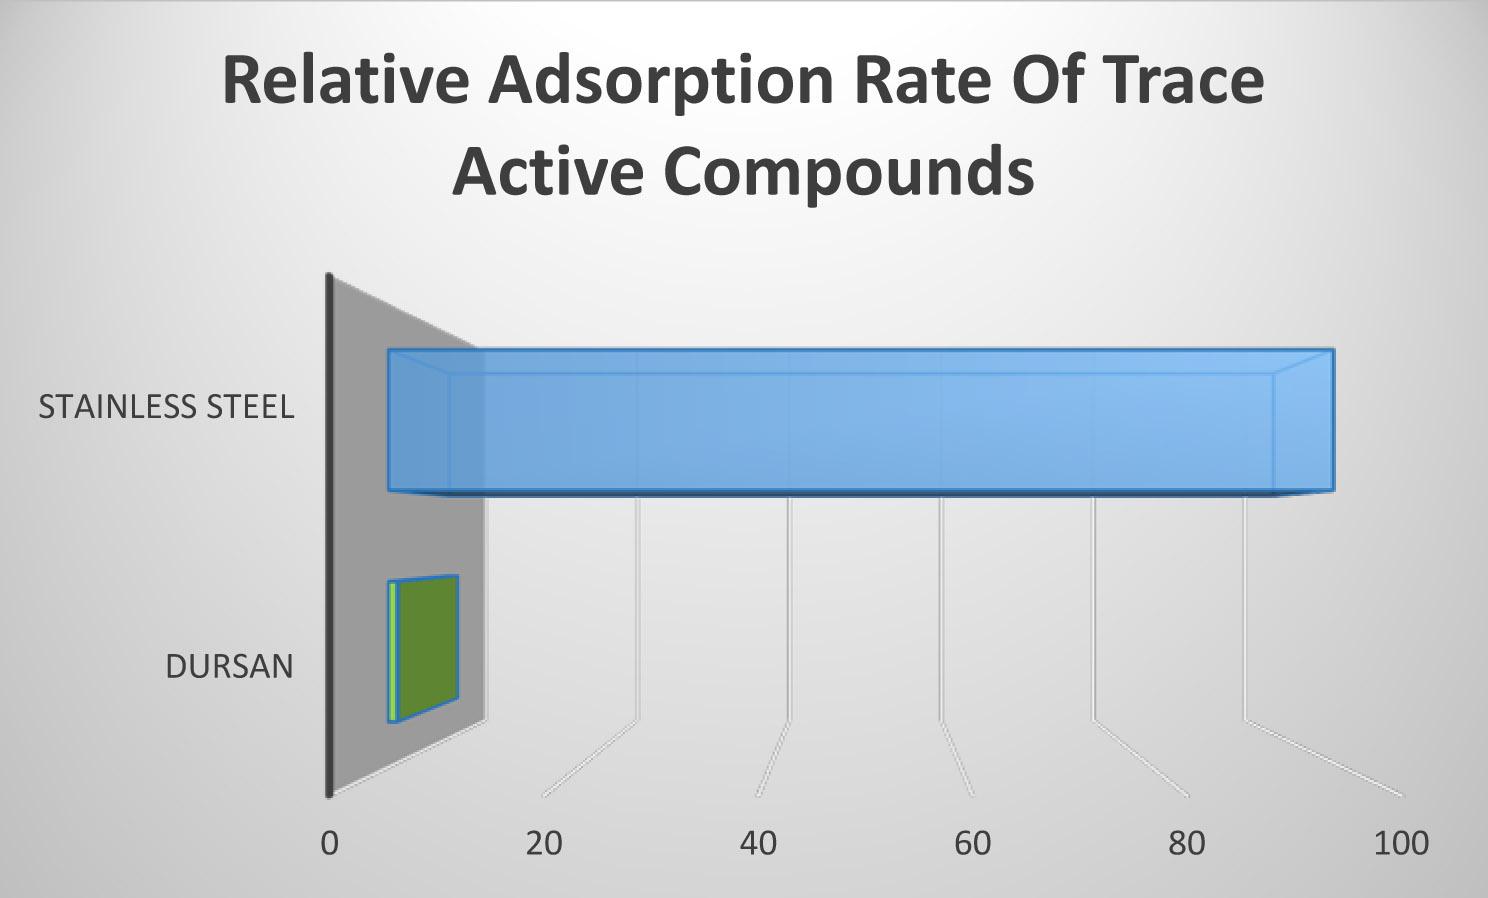 Dursan_adsorption_rate_2_18_16.jpg